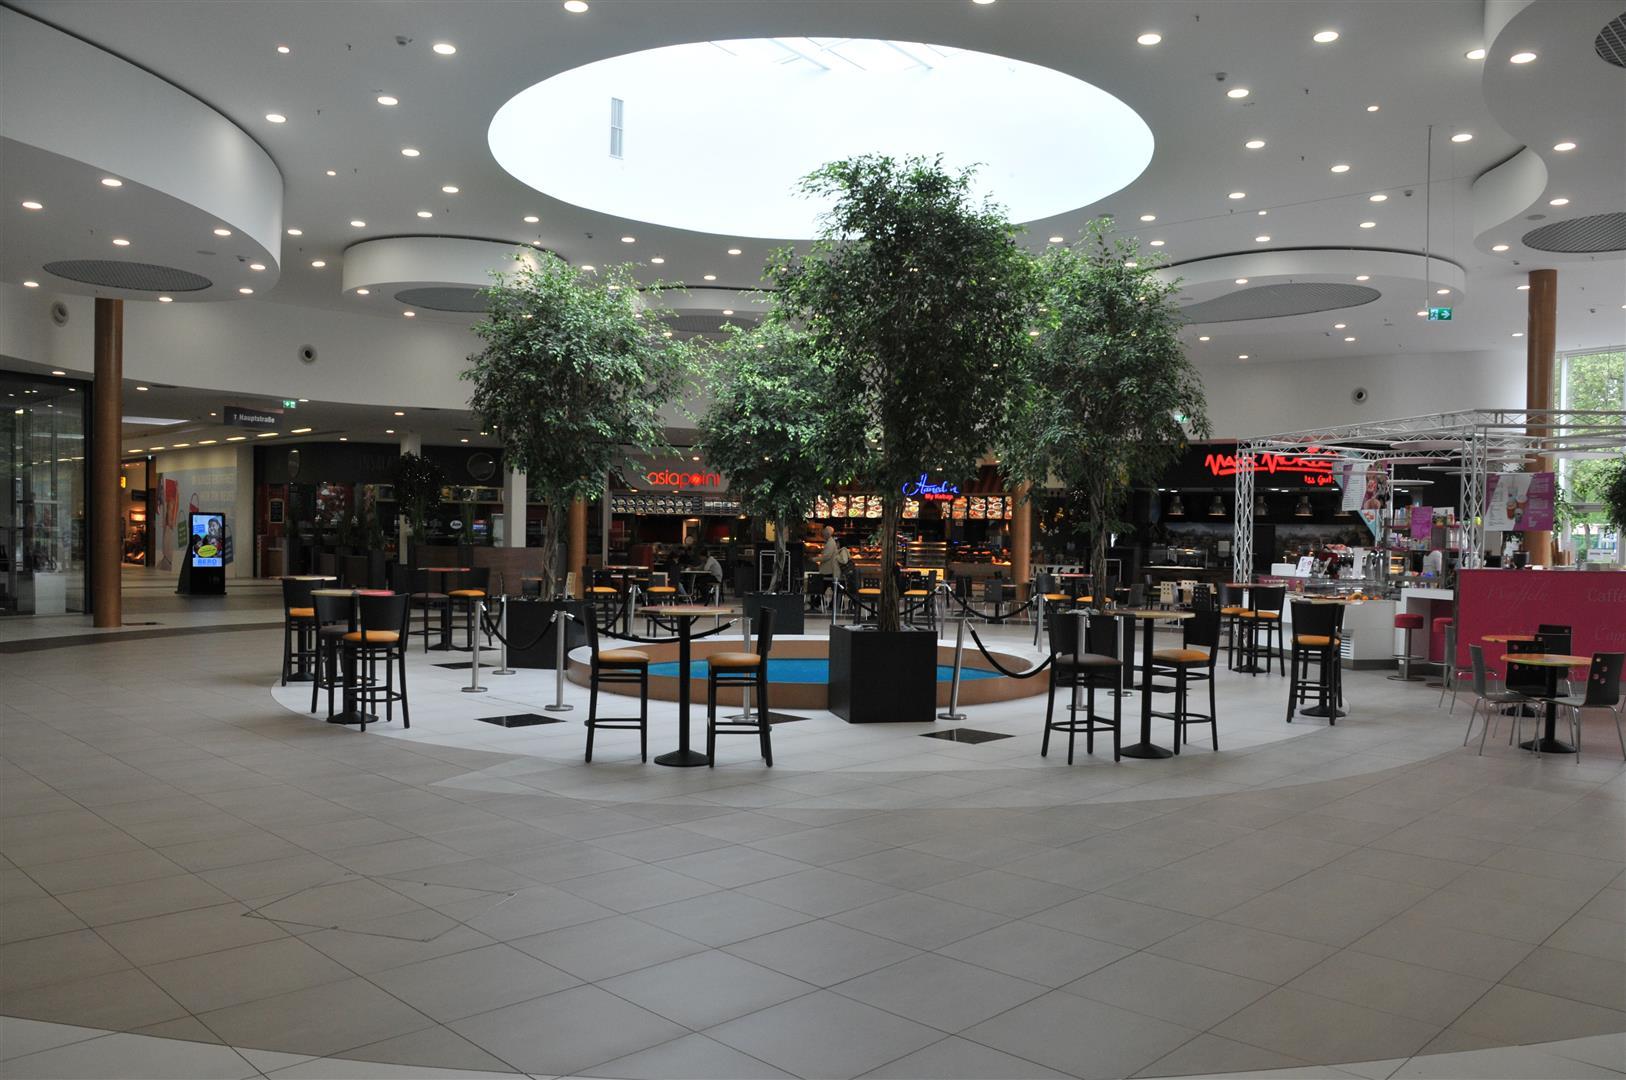 bero center in oberhausen einkaufsm glichkeiten zentrum oberhausen ten brinke groep. Black Bedroom Furniture Sets. Home Design Ideas